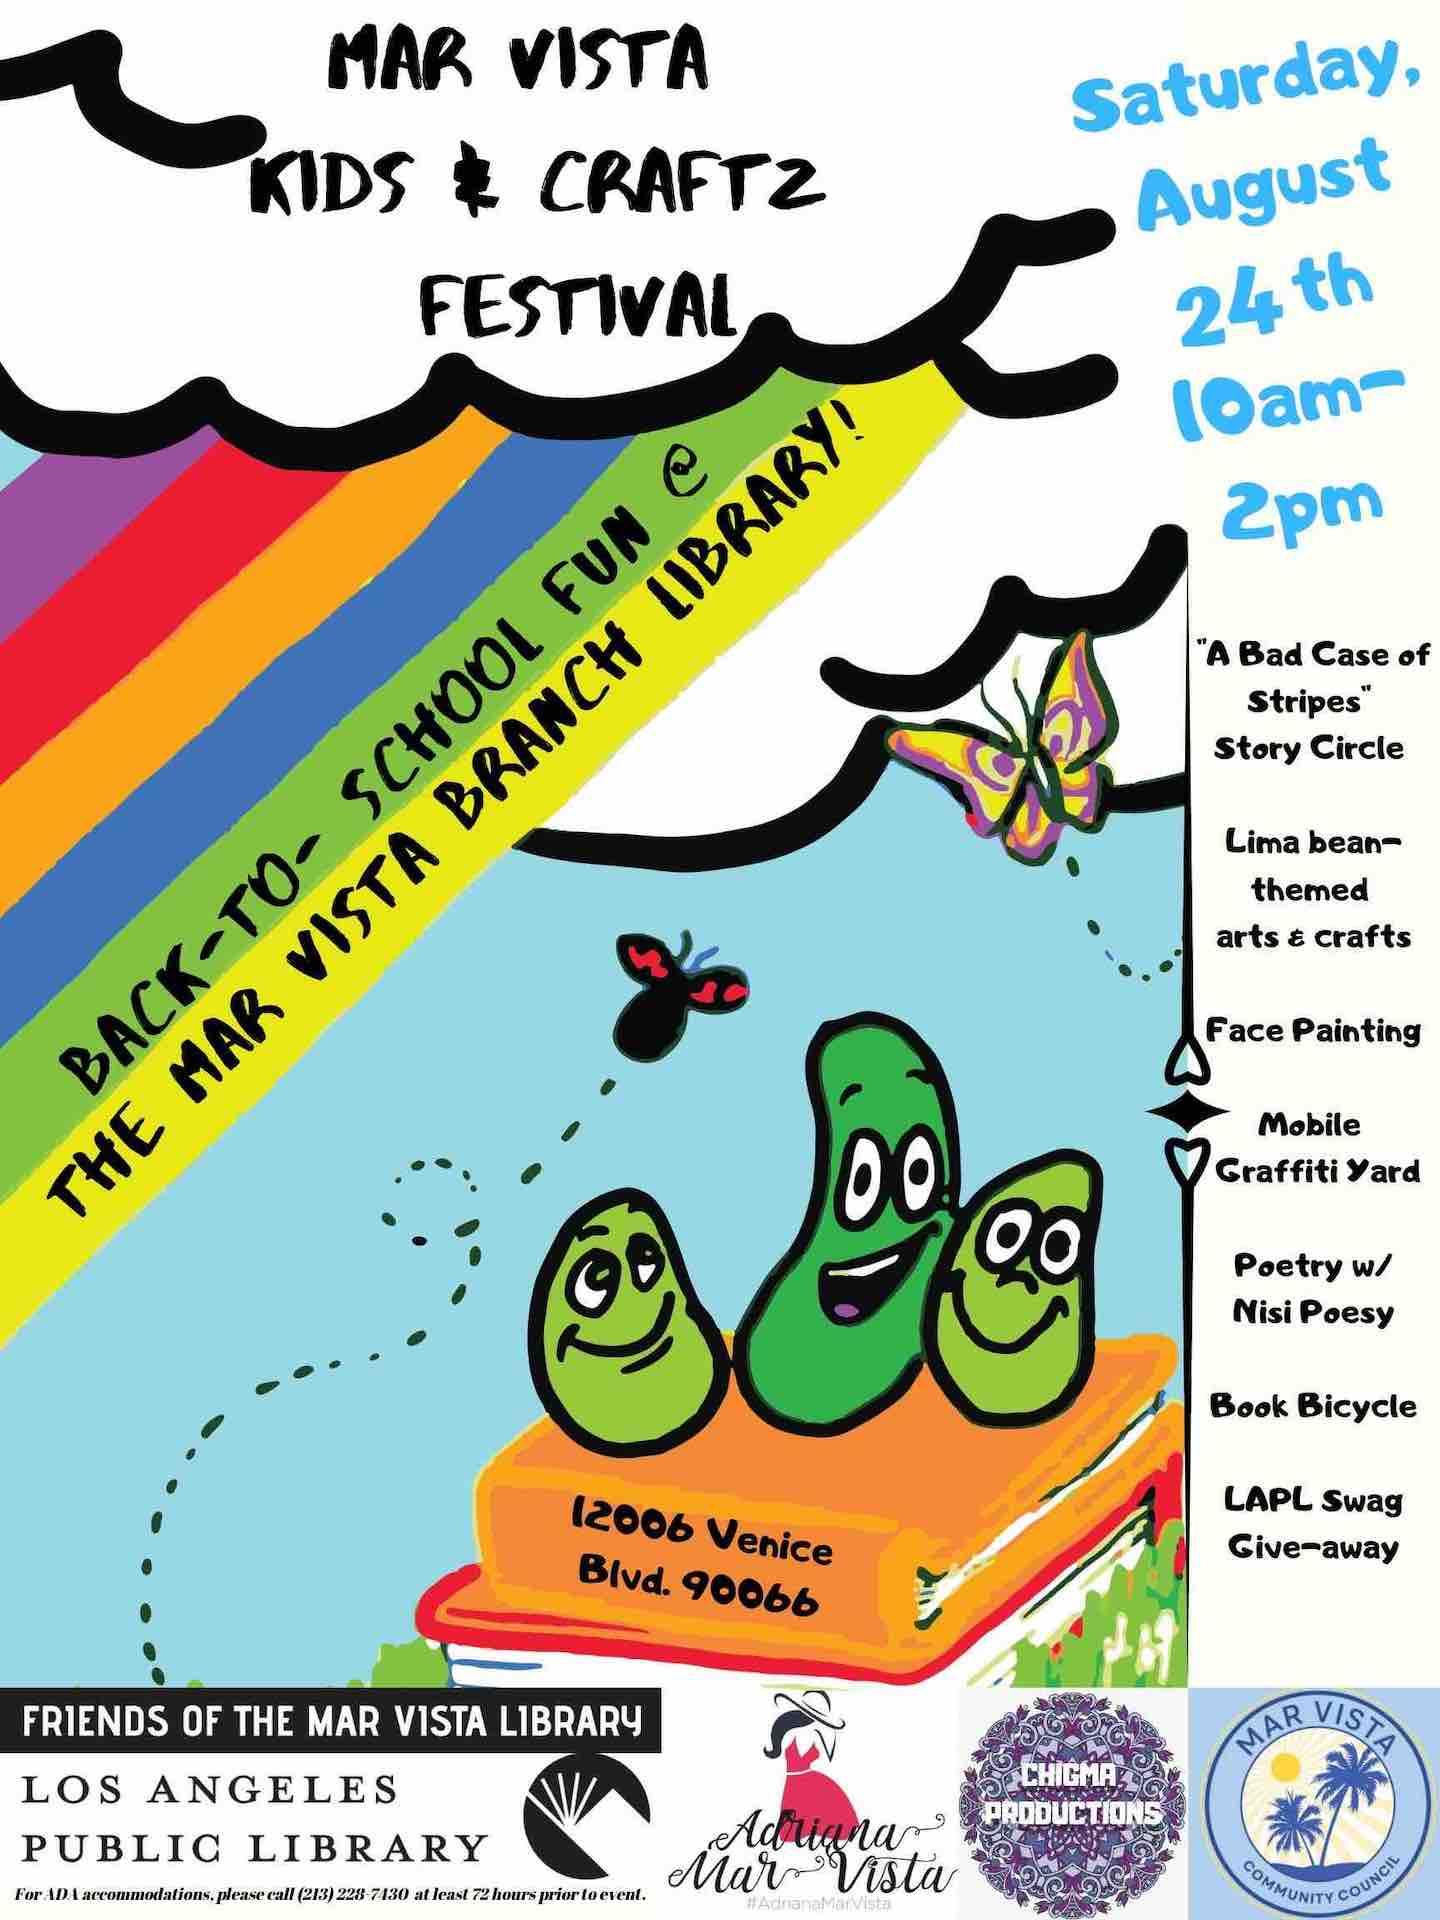 Mar Vista Kids & Craftz Festival